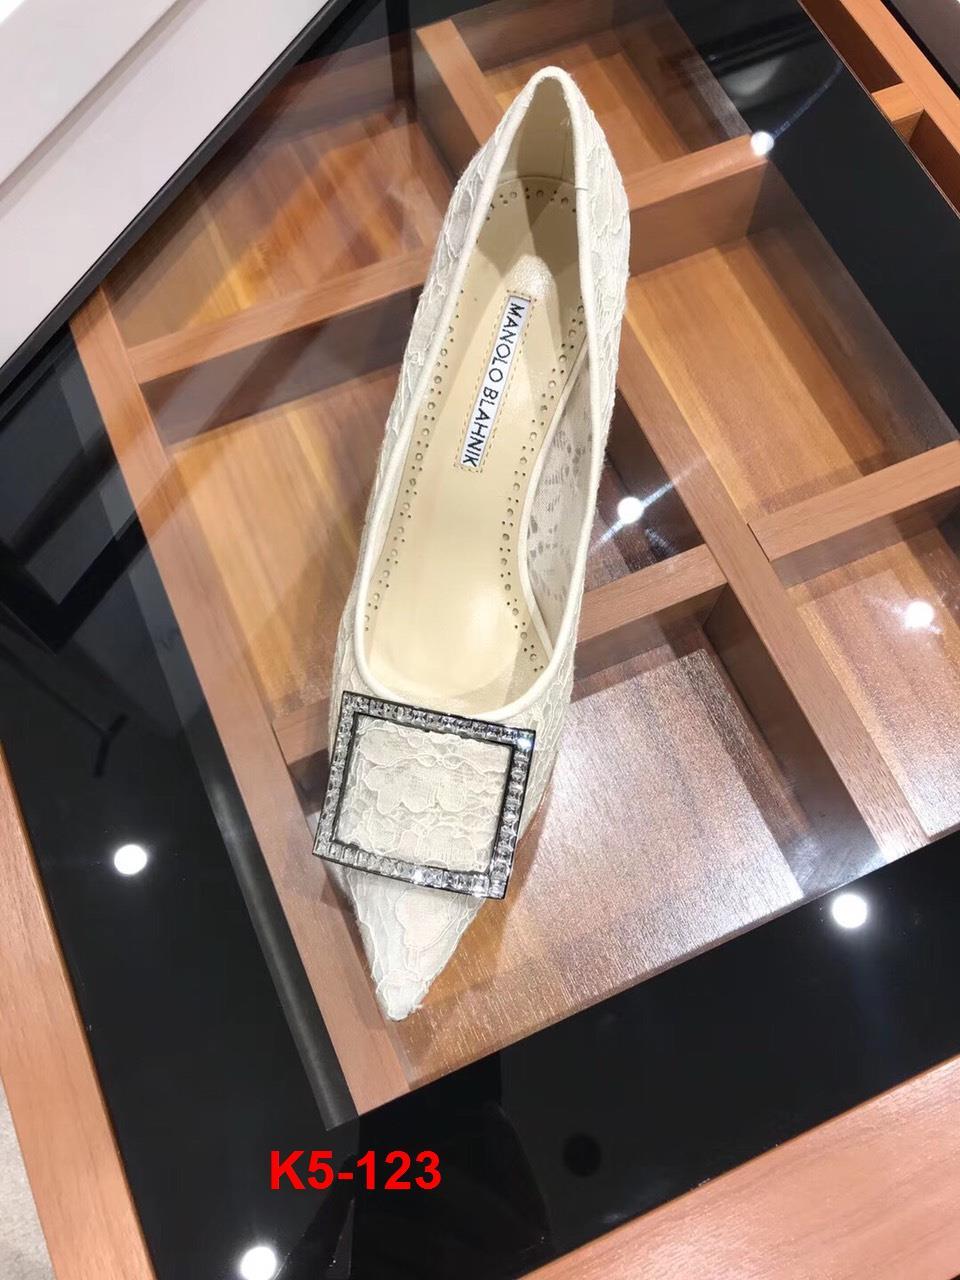 K5-123 Manolo Blahnik giày cao 7cm siêu cấp